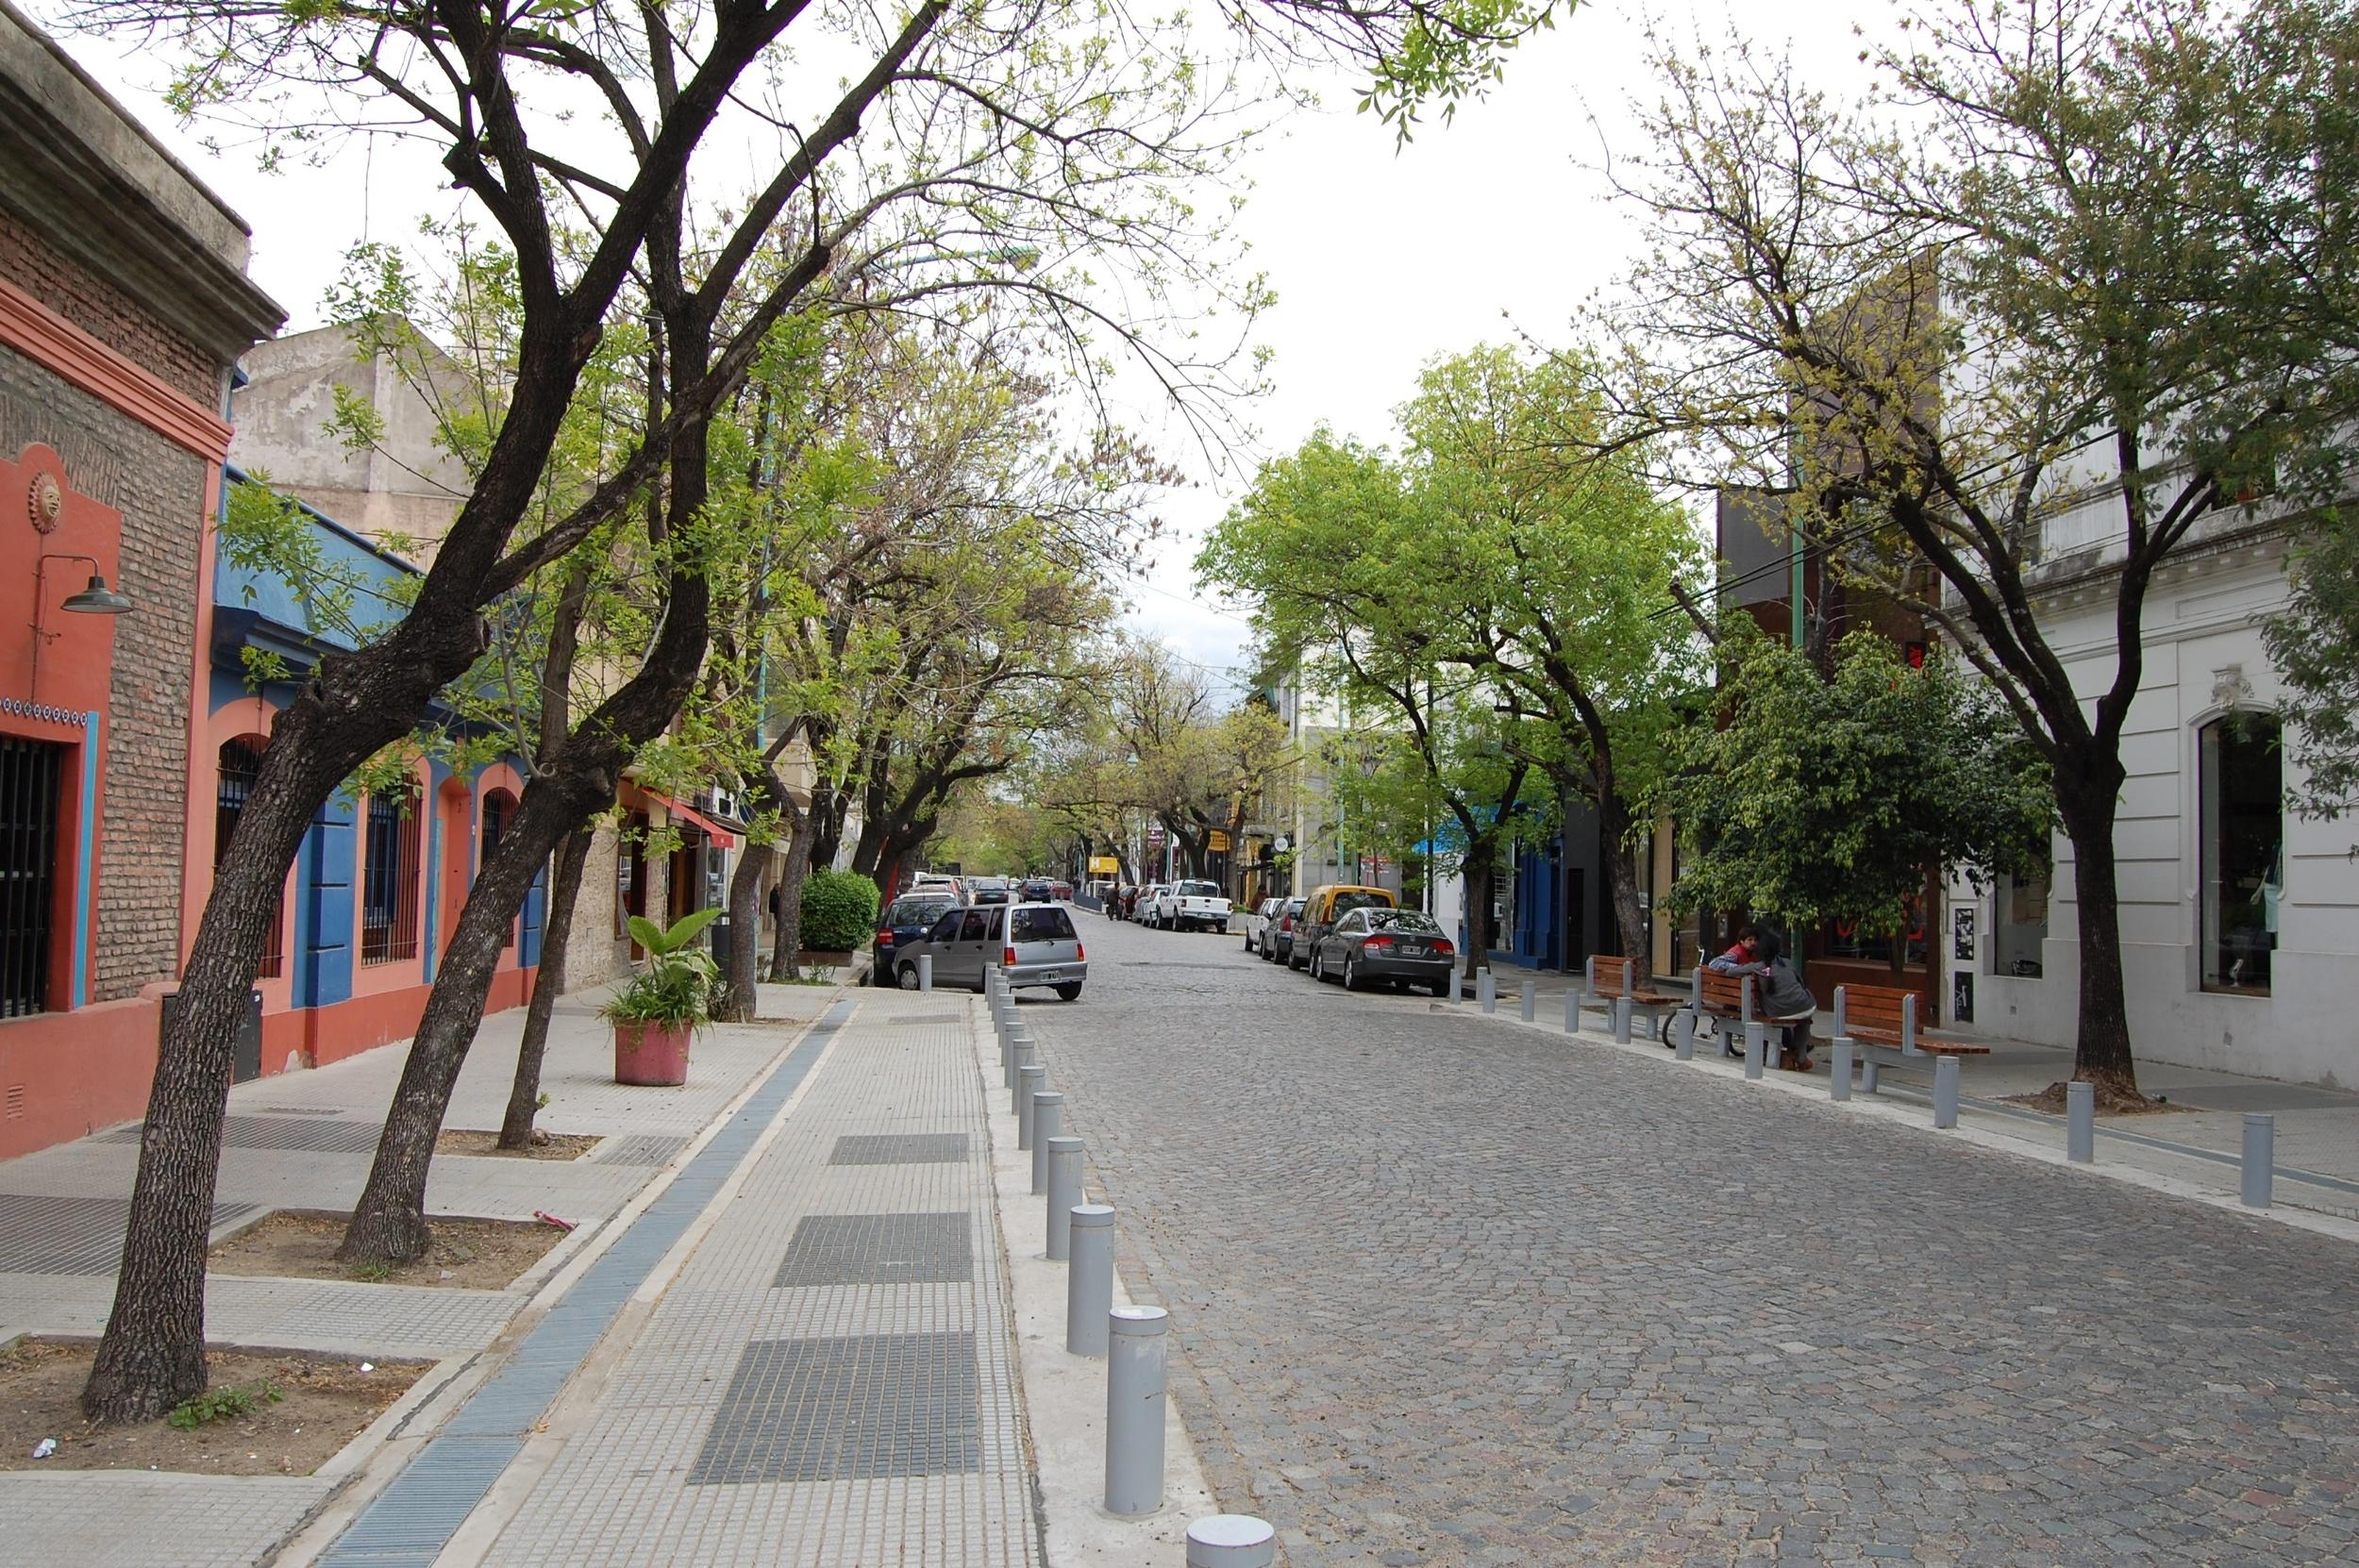 A_cobblestoned_street_in_Palermo_Soho.jpg